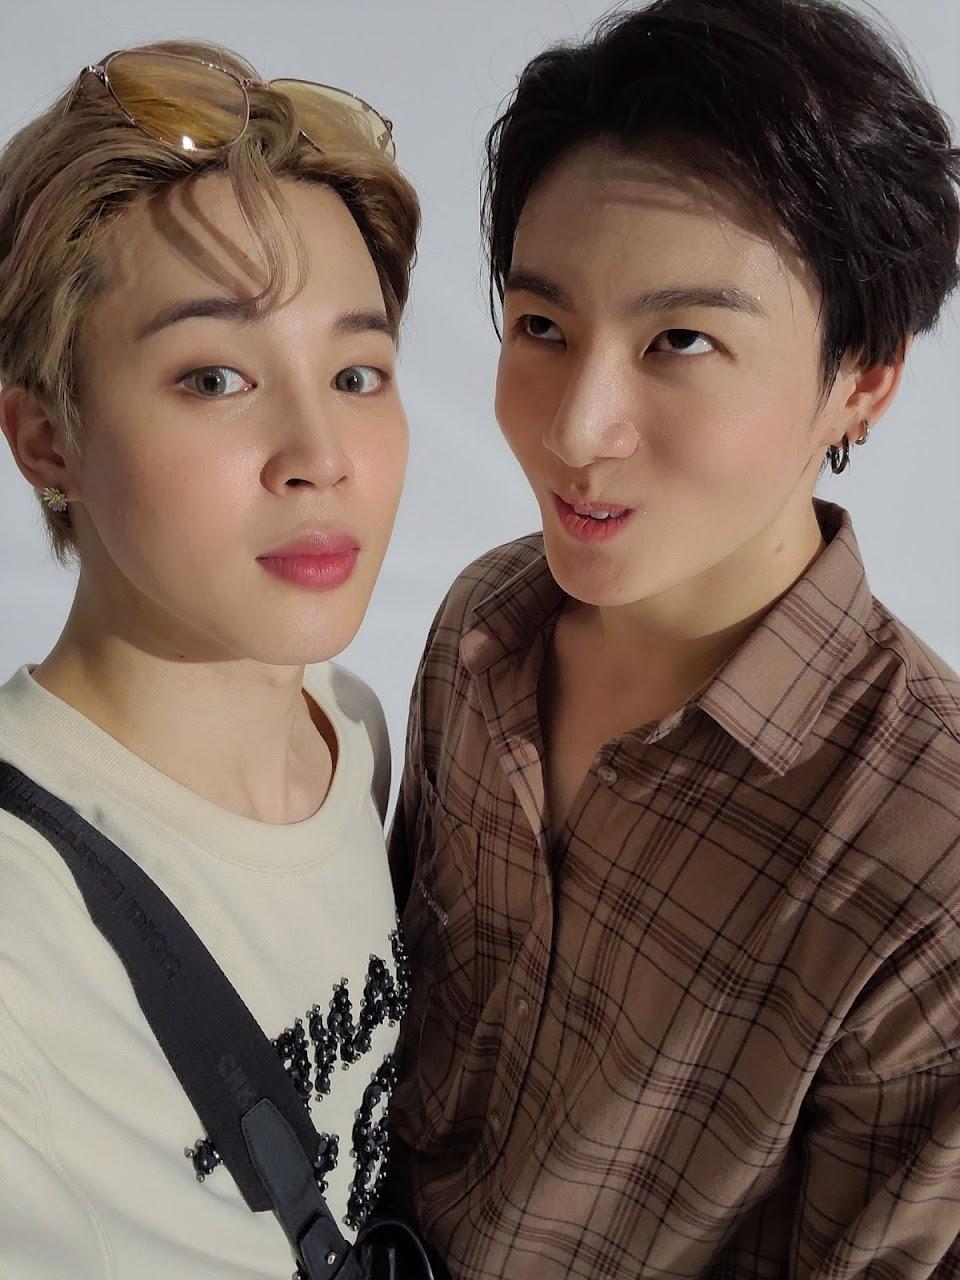 Jimin Funny : jimin, funny, BTS's, Jungkook, Jimin, Humor, Understand, Koreaboo